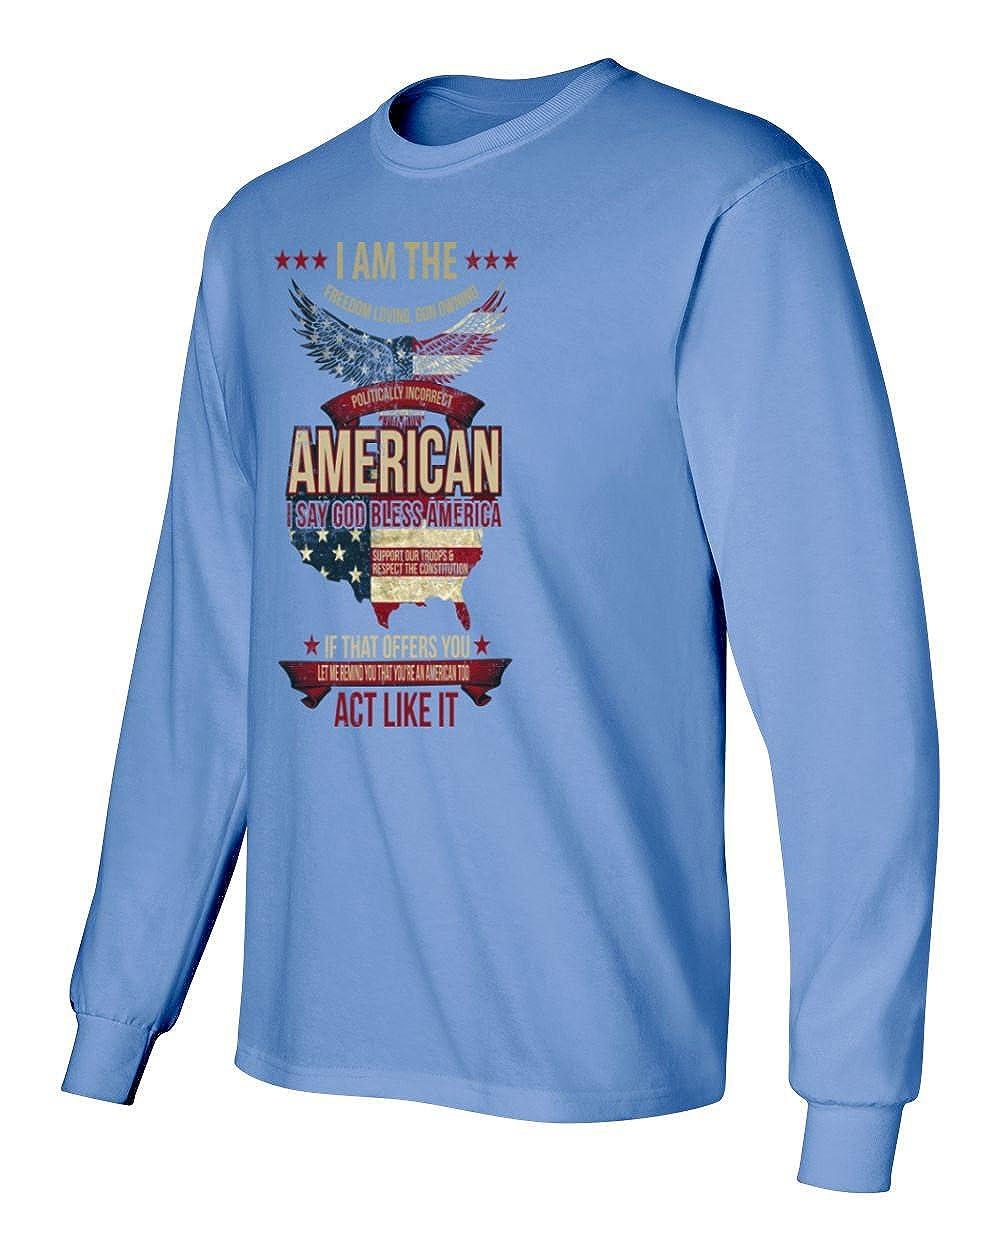 RIVEBELLA Patriotic Politically Incorrect American Mens Long Sleeve T-Shirt